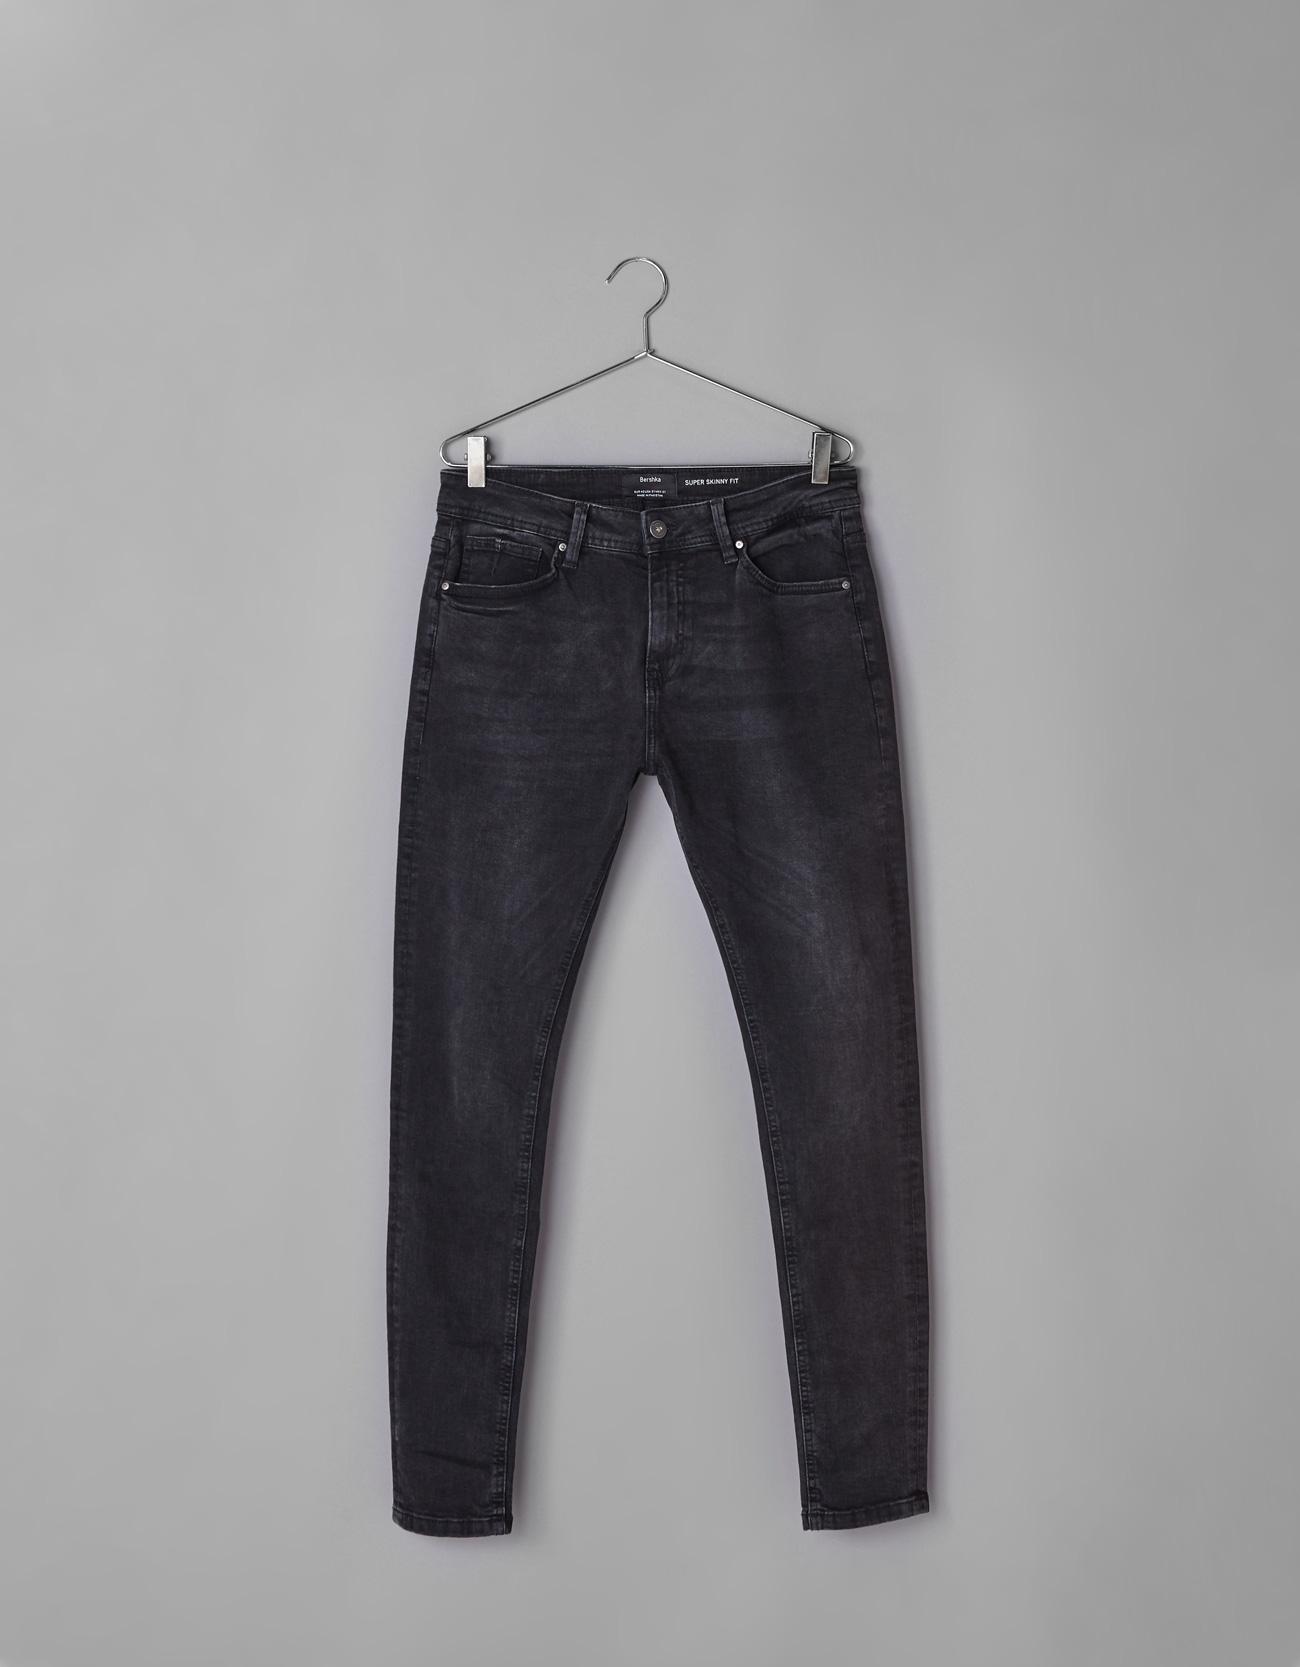 0f3fd60da3 Super Skinny Fit Jeans - CLOTHES - Bershka Bosnia and Herzegovina